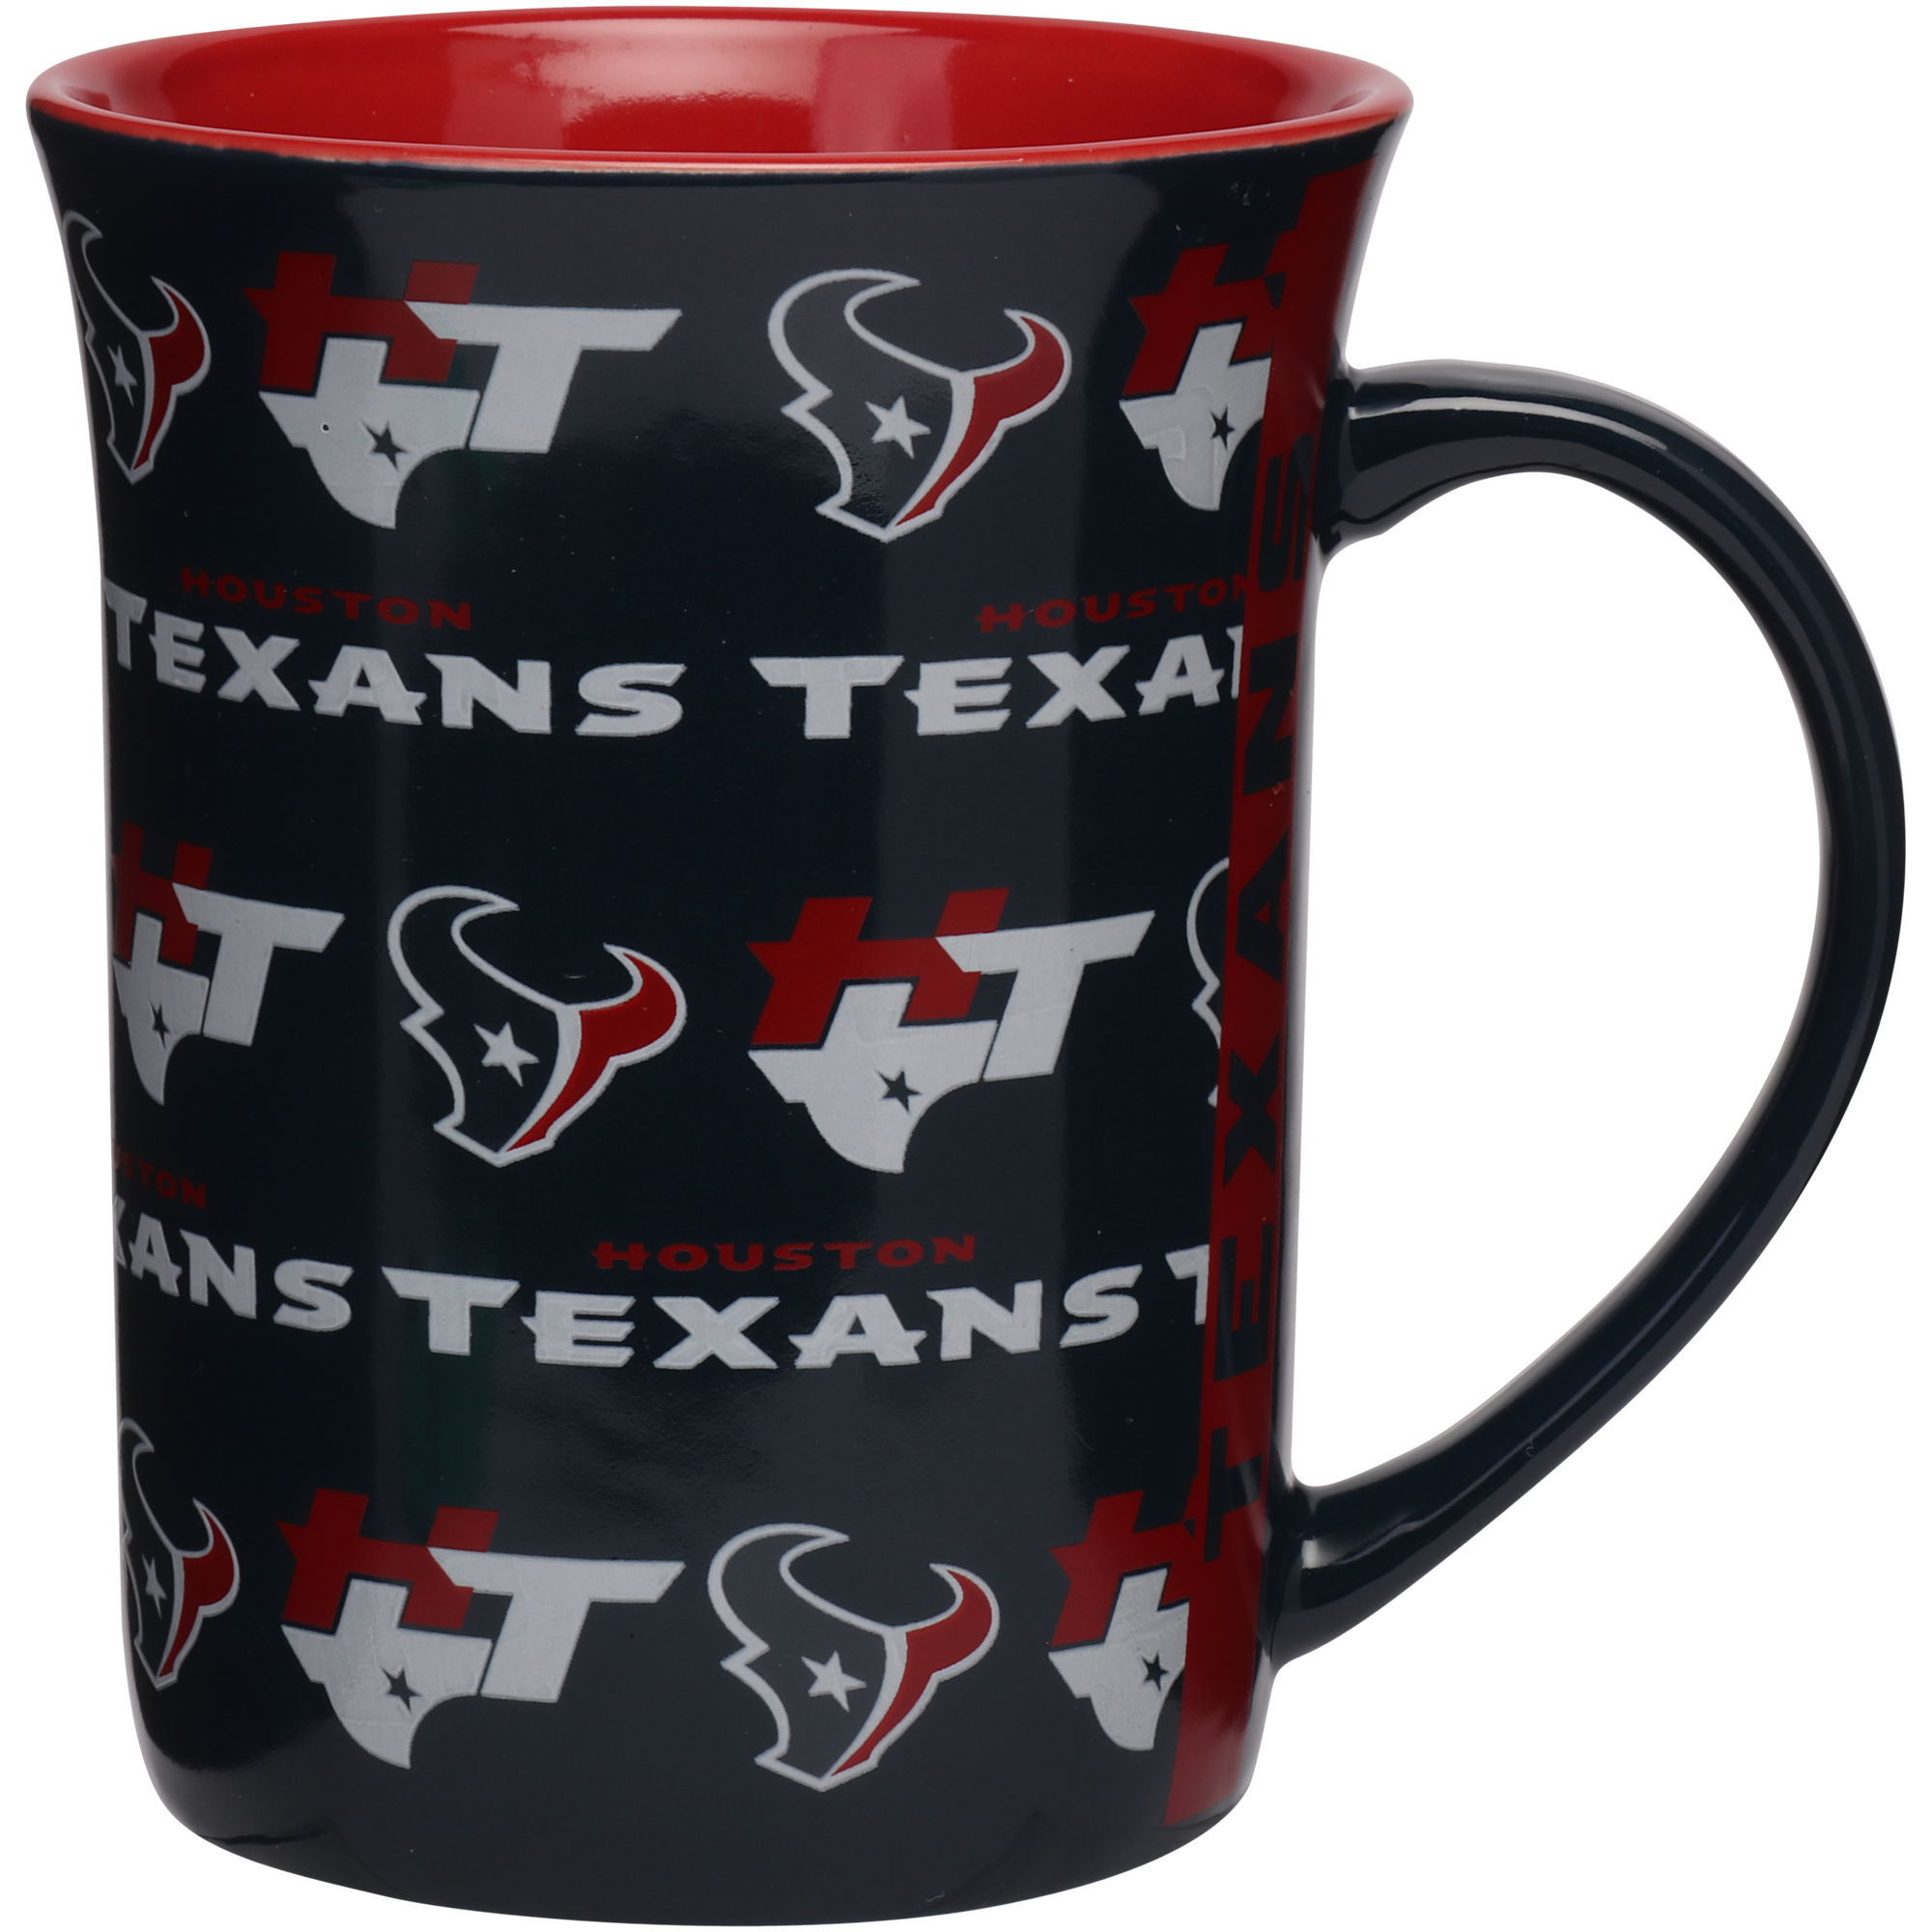 Houston Texans 15oz. Line Up Mug - No Size